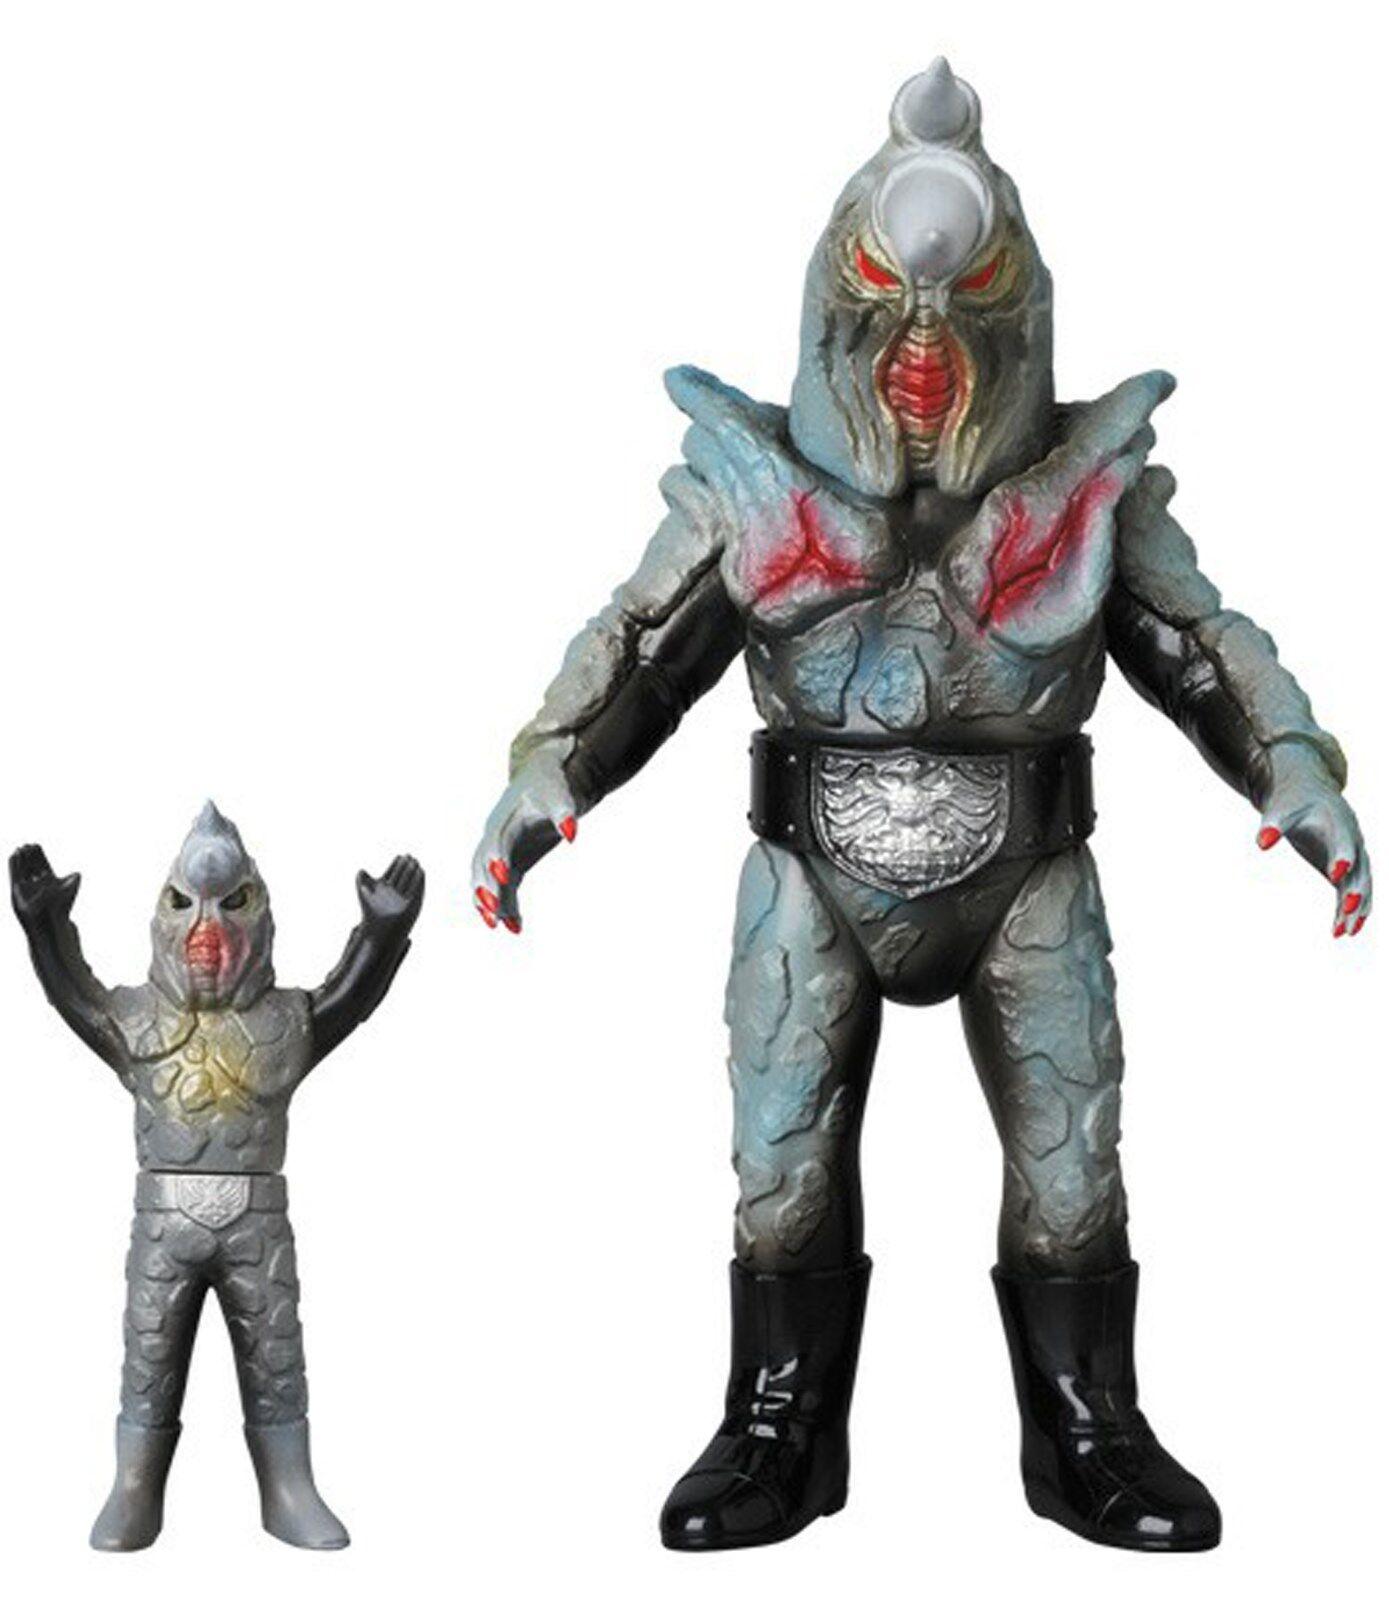 Masked Rider Kaijin Rhinogang Renewal Farbe and Mini Soft Vinyl Figure Medicom